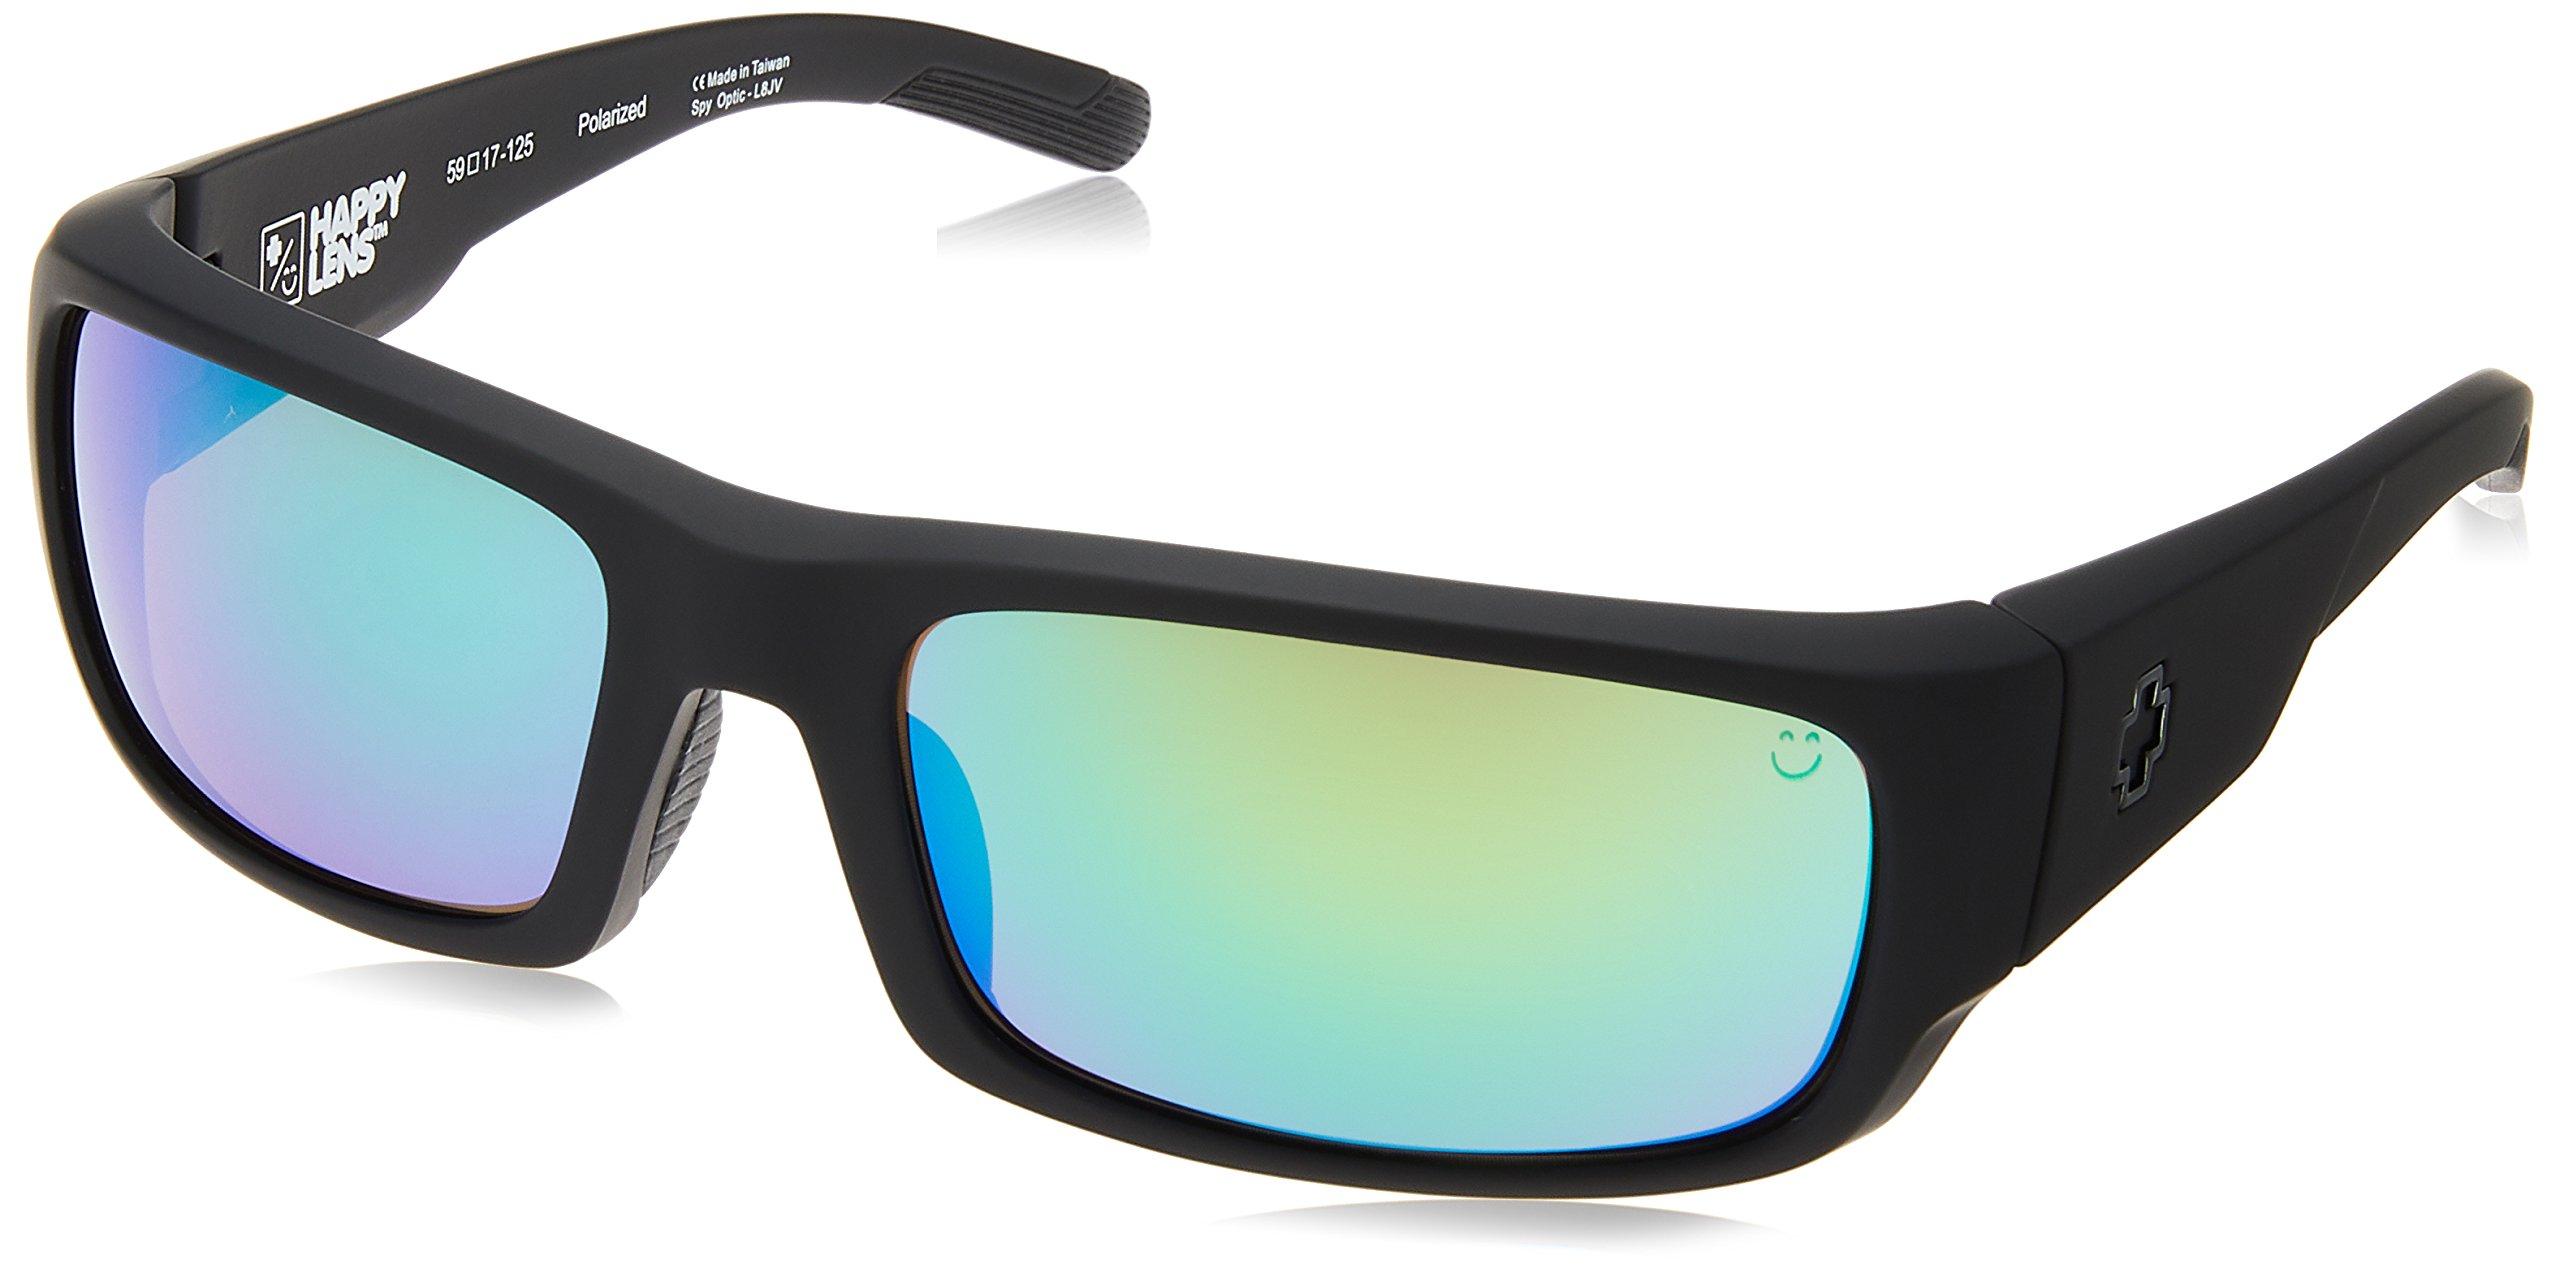 7d4c267759f Spy Optic Caliber Wrap Sunglasses